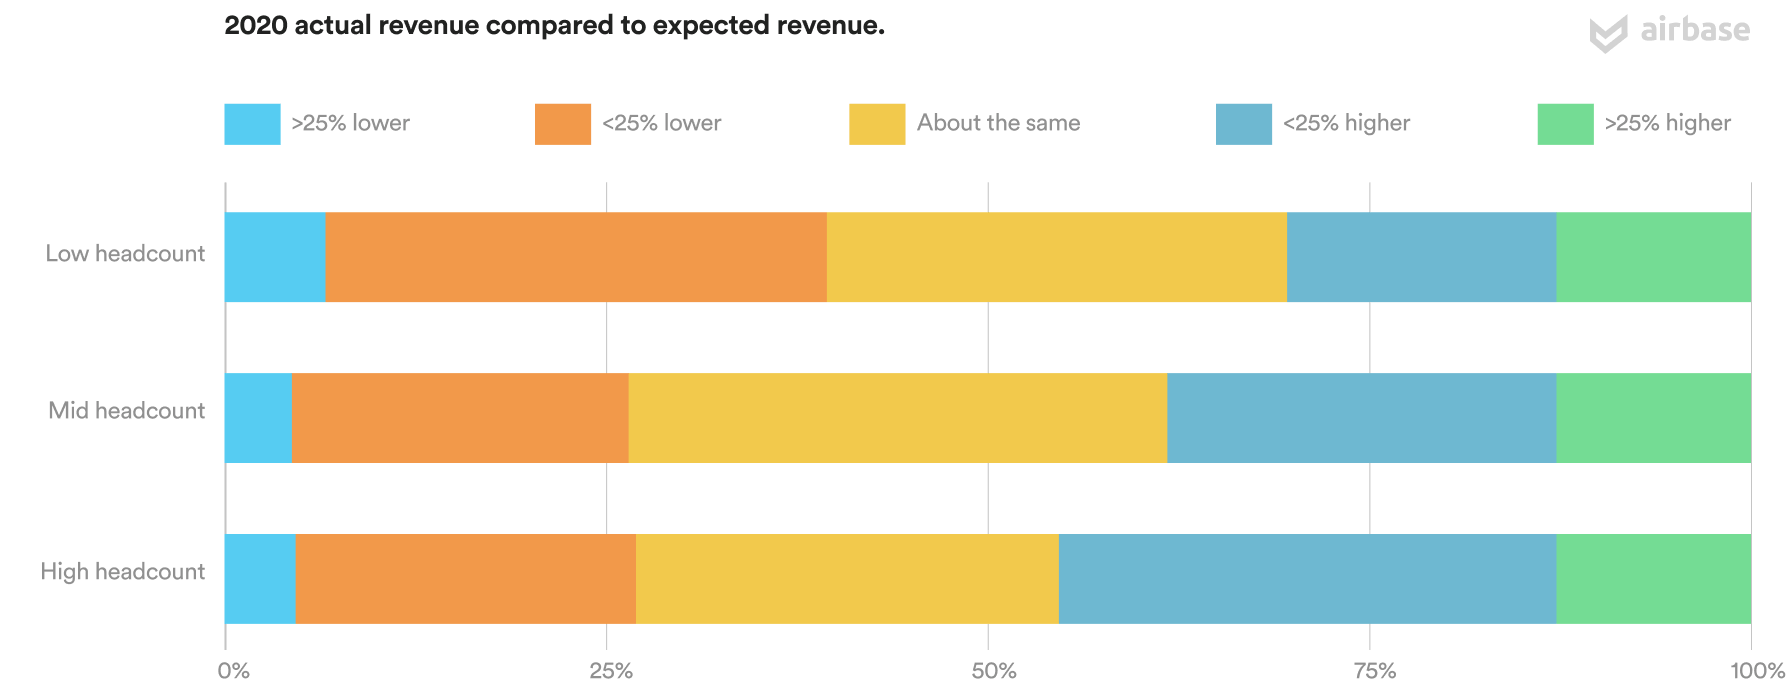 2020 actual revenue compared to expected revenue.